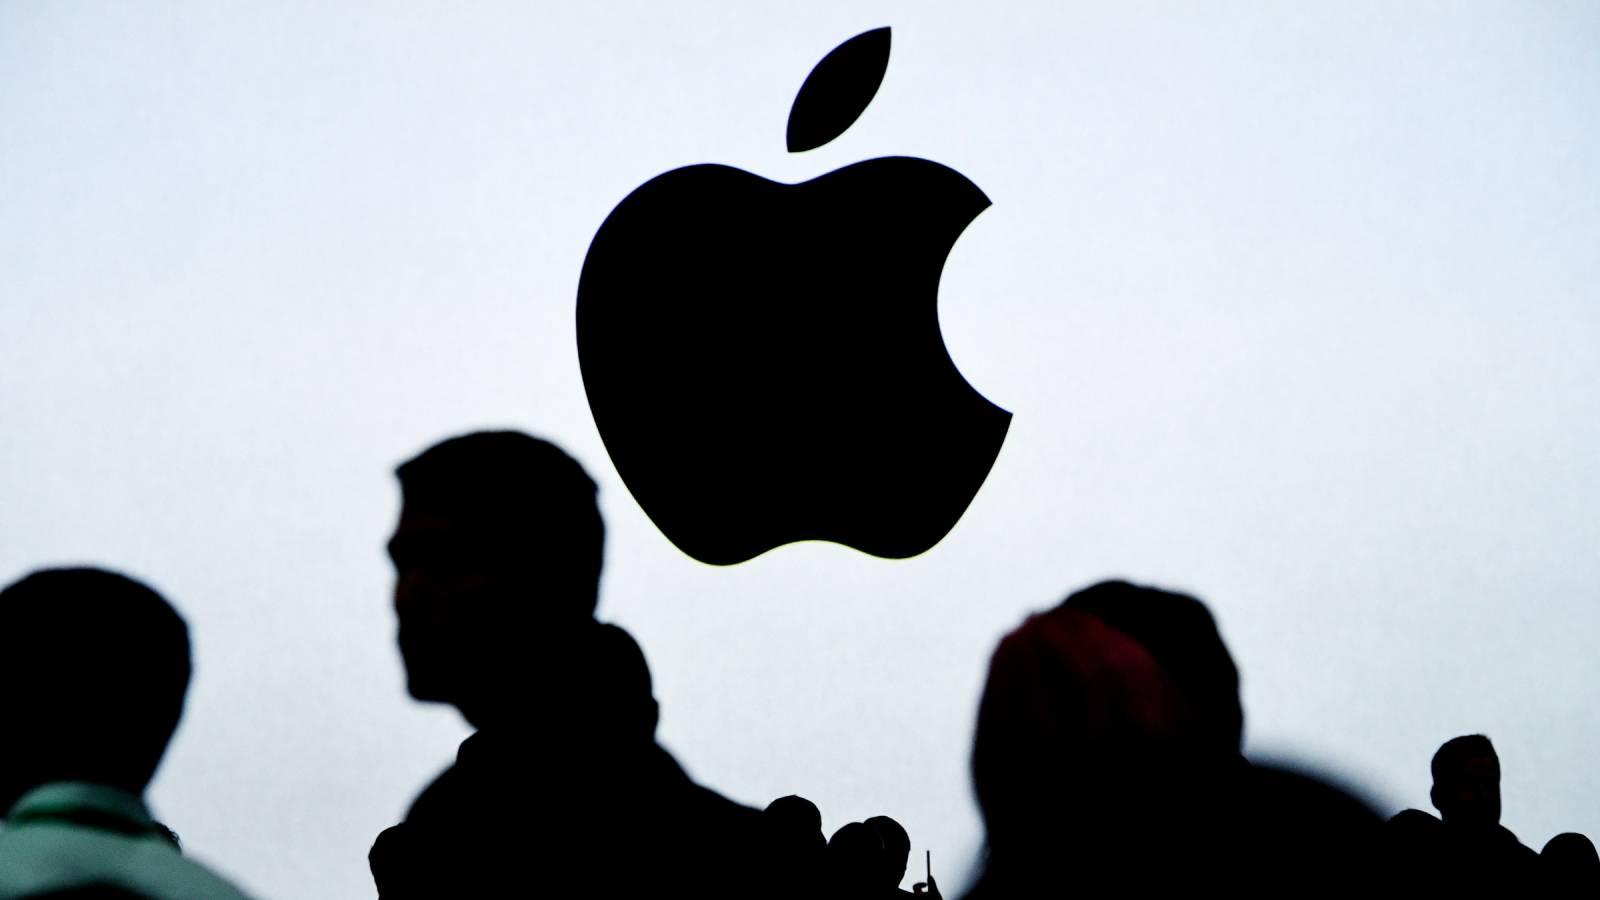 Apple va Furniza Telefoane iPhone cu Jailbreak catre Cercetatori